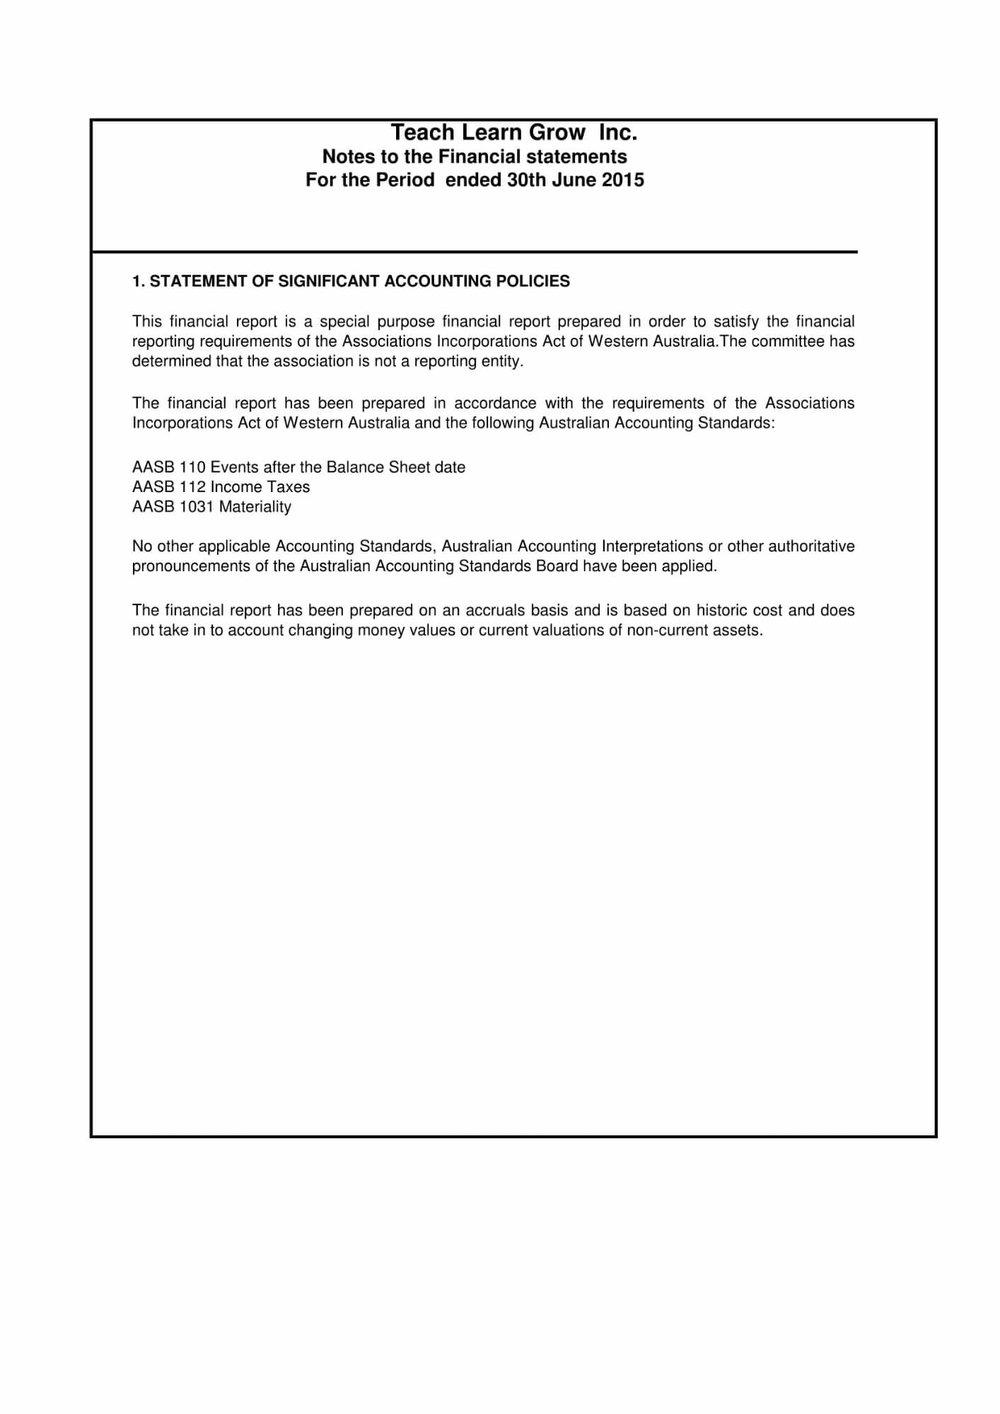 tlg-annual-report-FY14-22.jpg